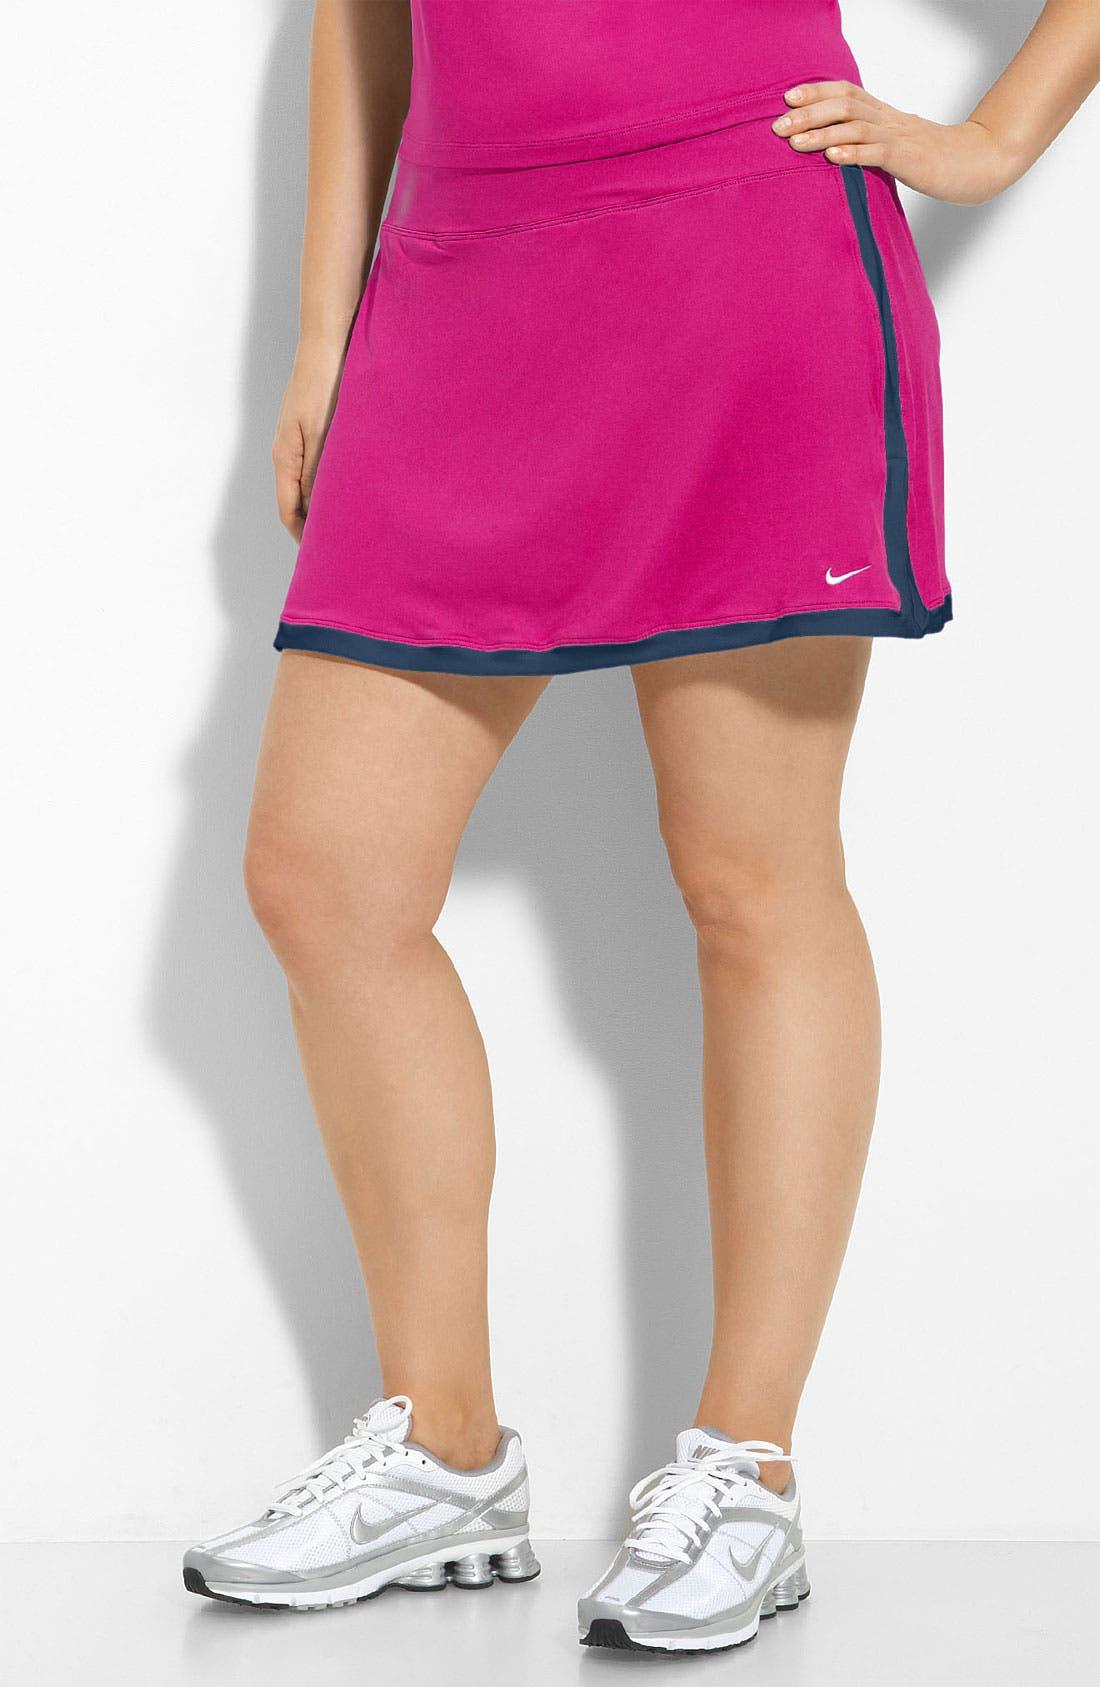 Main Image - Nike 'Border' Dri-FIT Tennis Skirt (Plus)